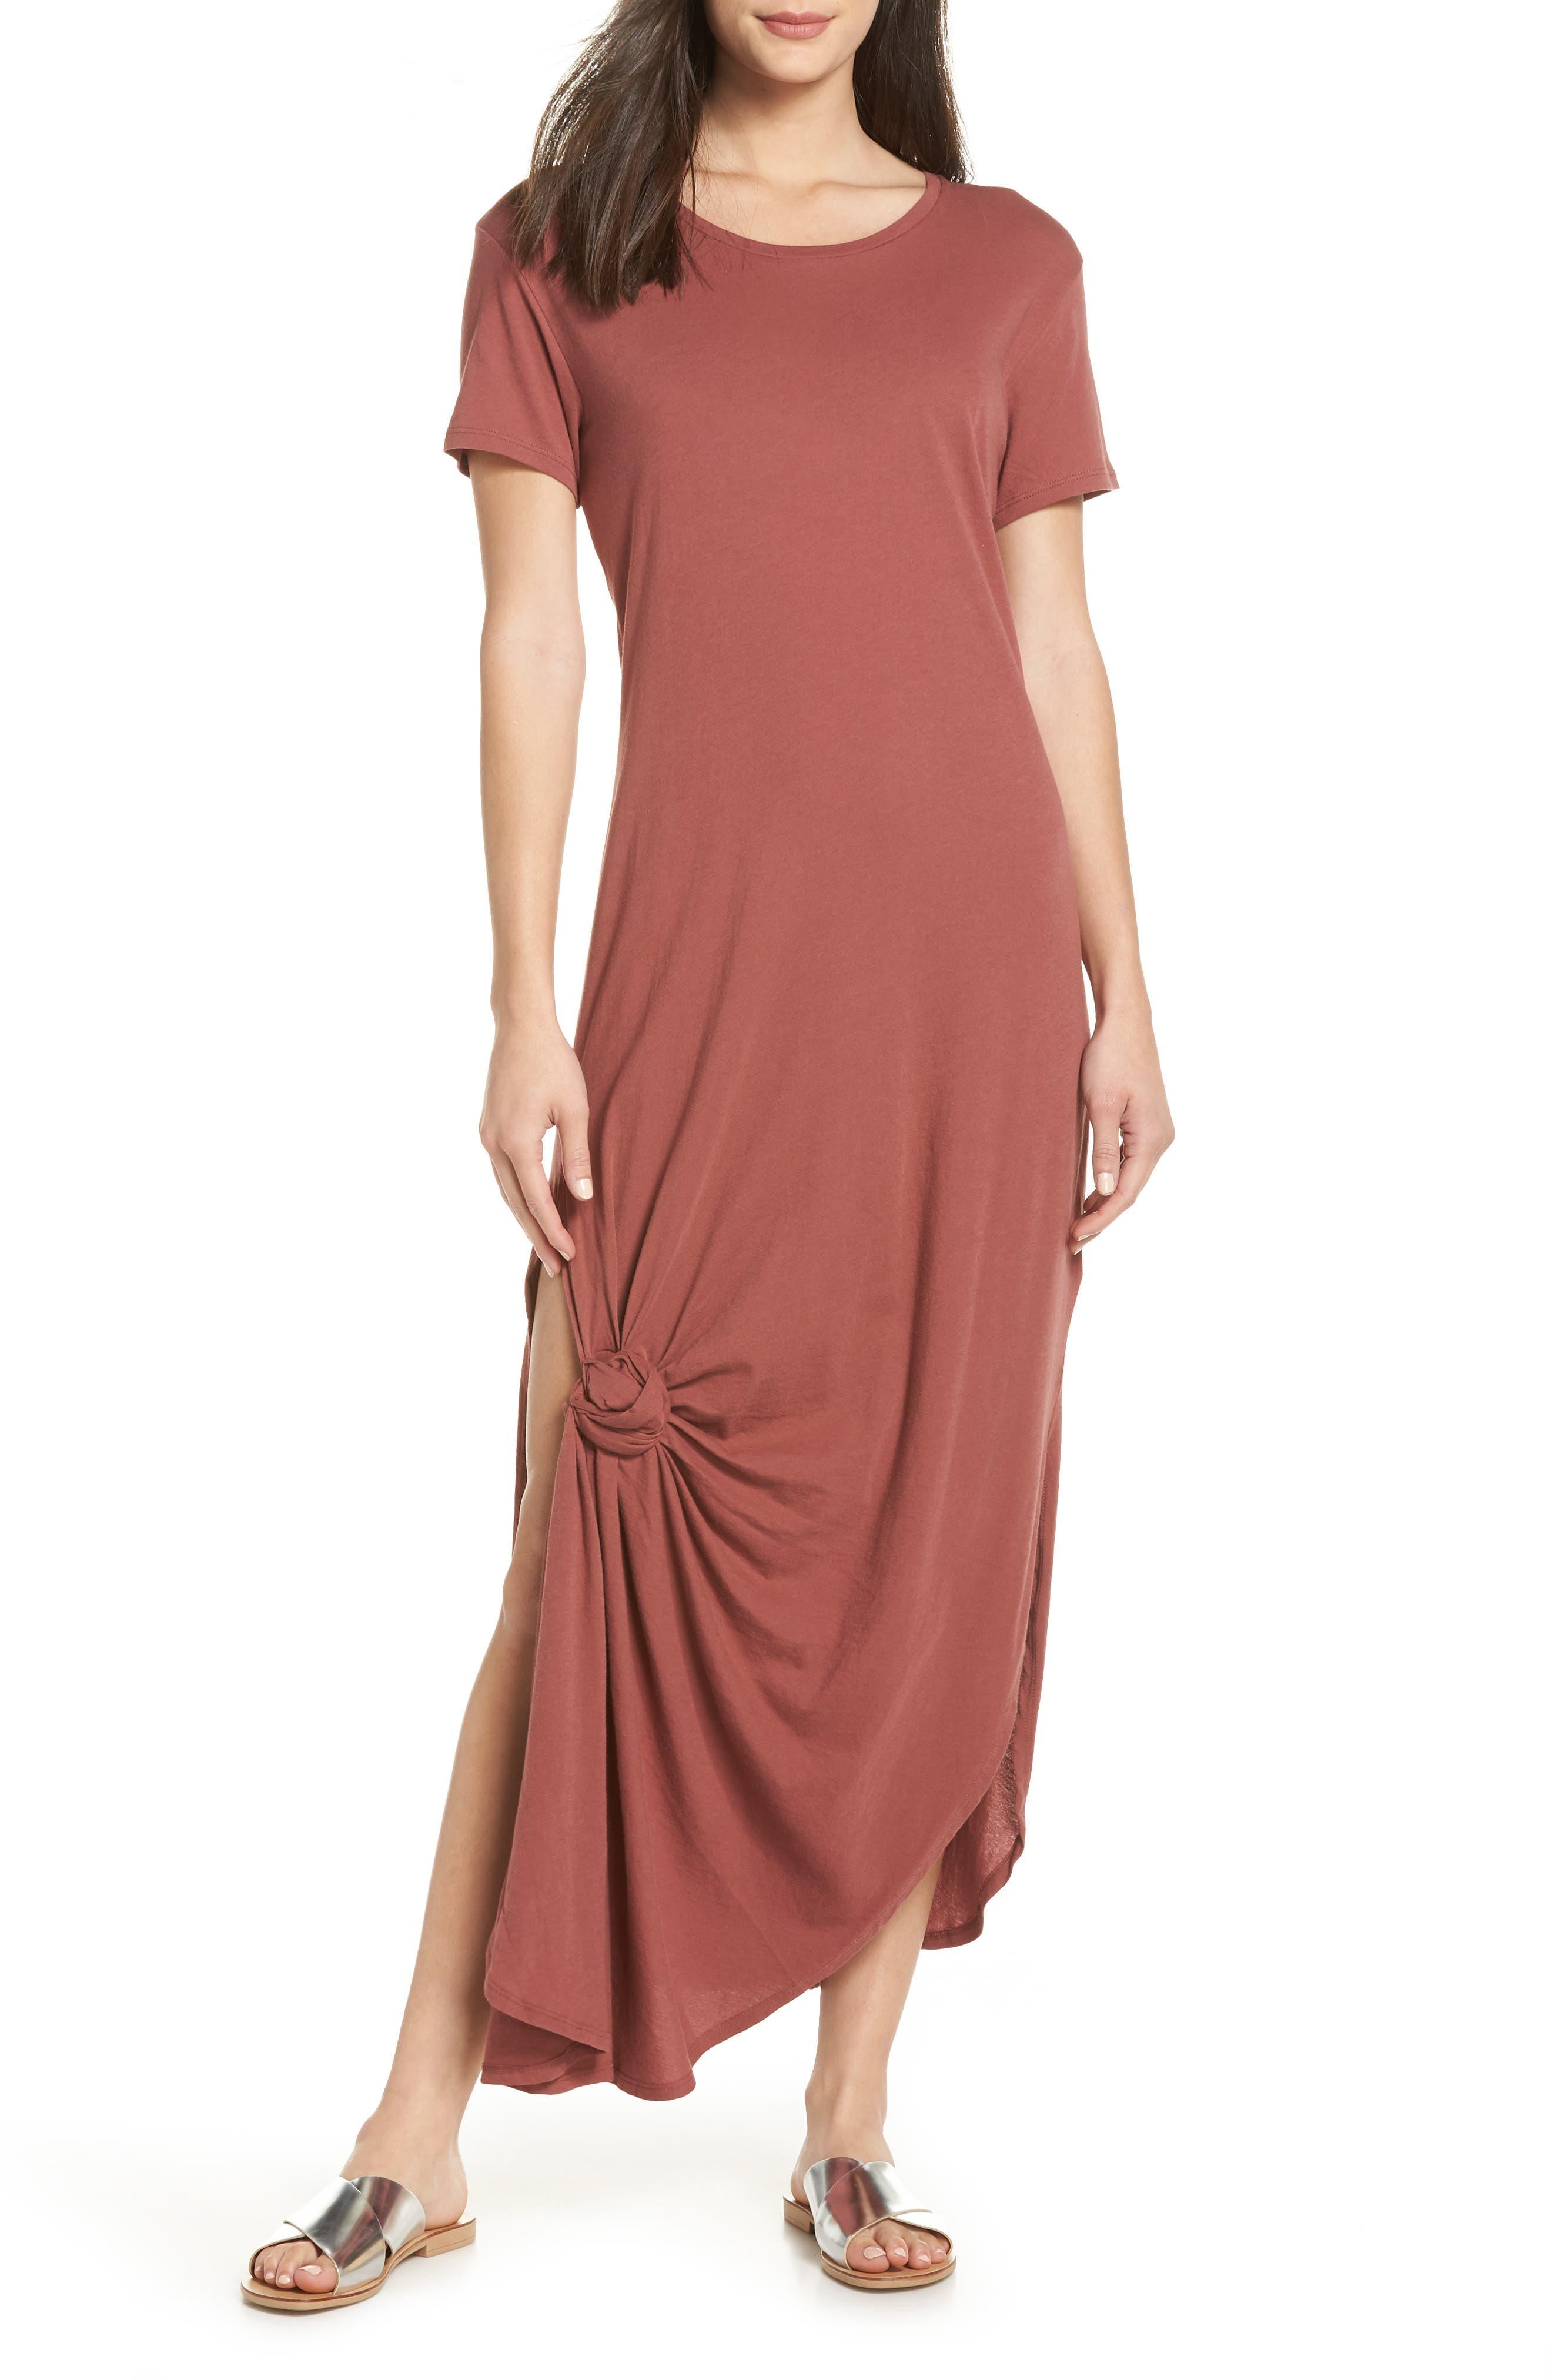 Jones Cover-Up Dress,                         Main,                         color, VINTAGE BERRY